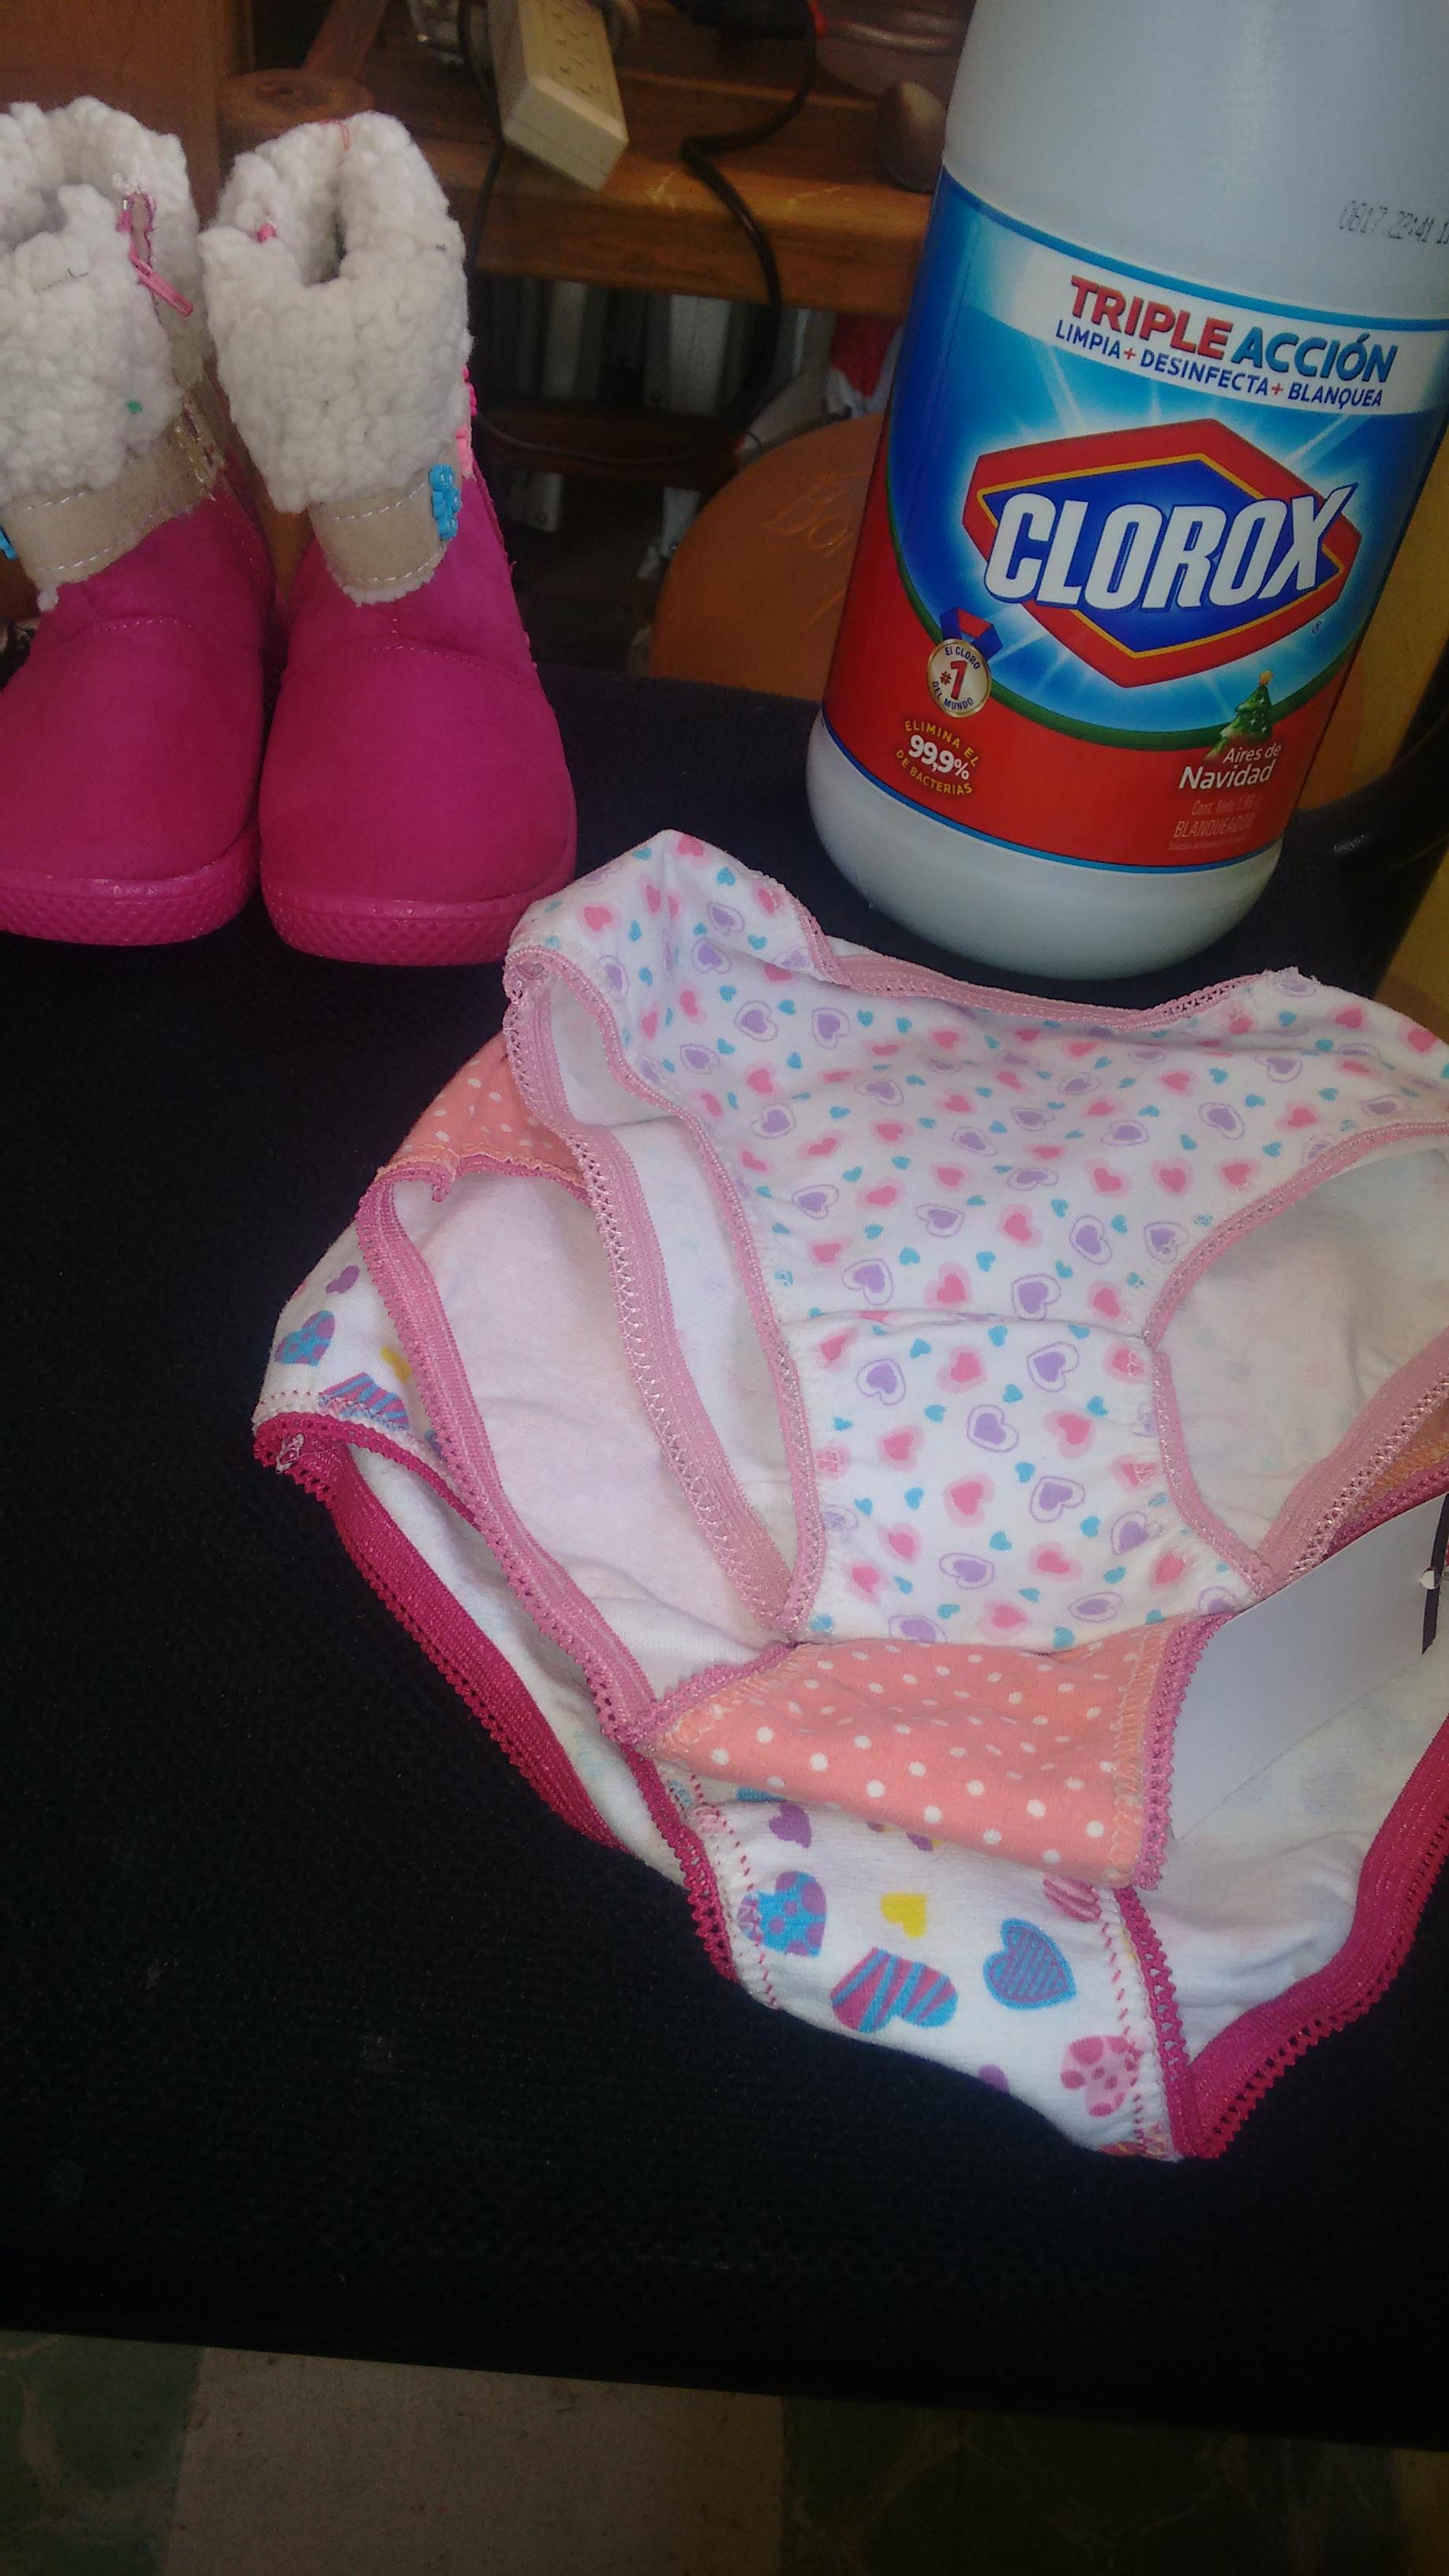 Bodega Aurrerá: Bikini para niña $3, Clorox 1.89l $5 botitas niña $20